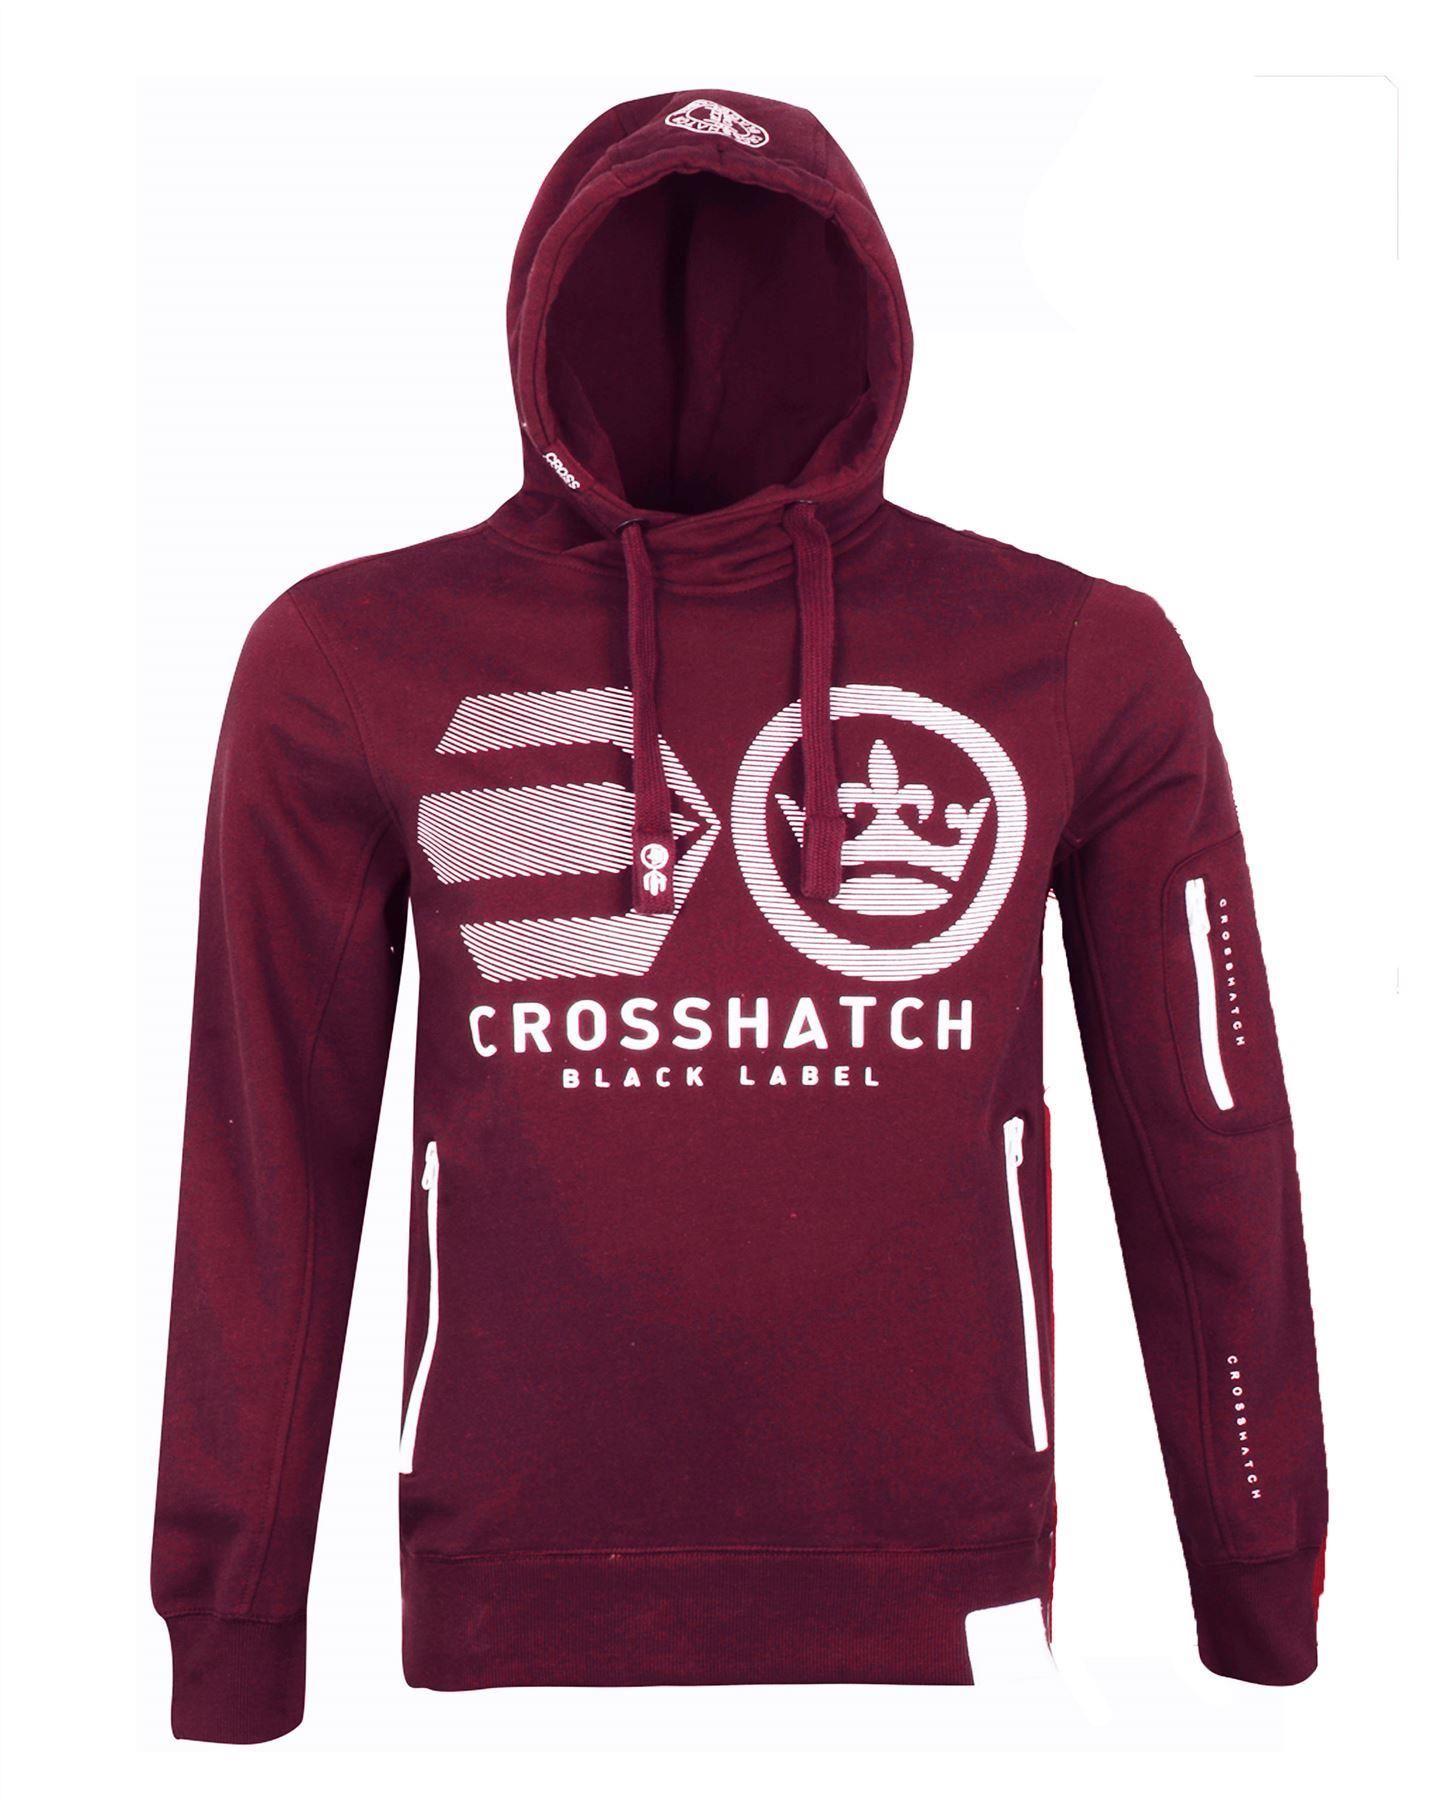 Brand new hoodie